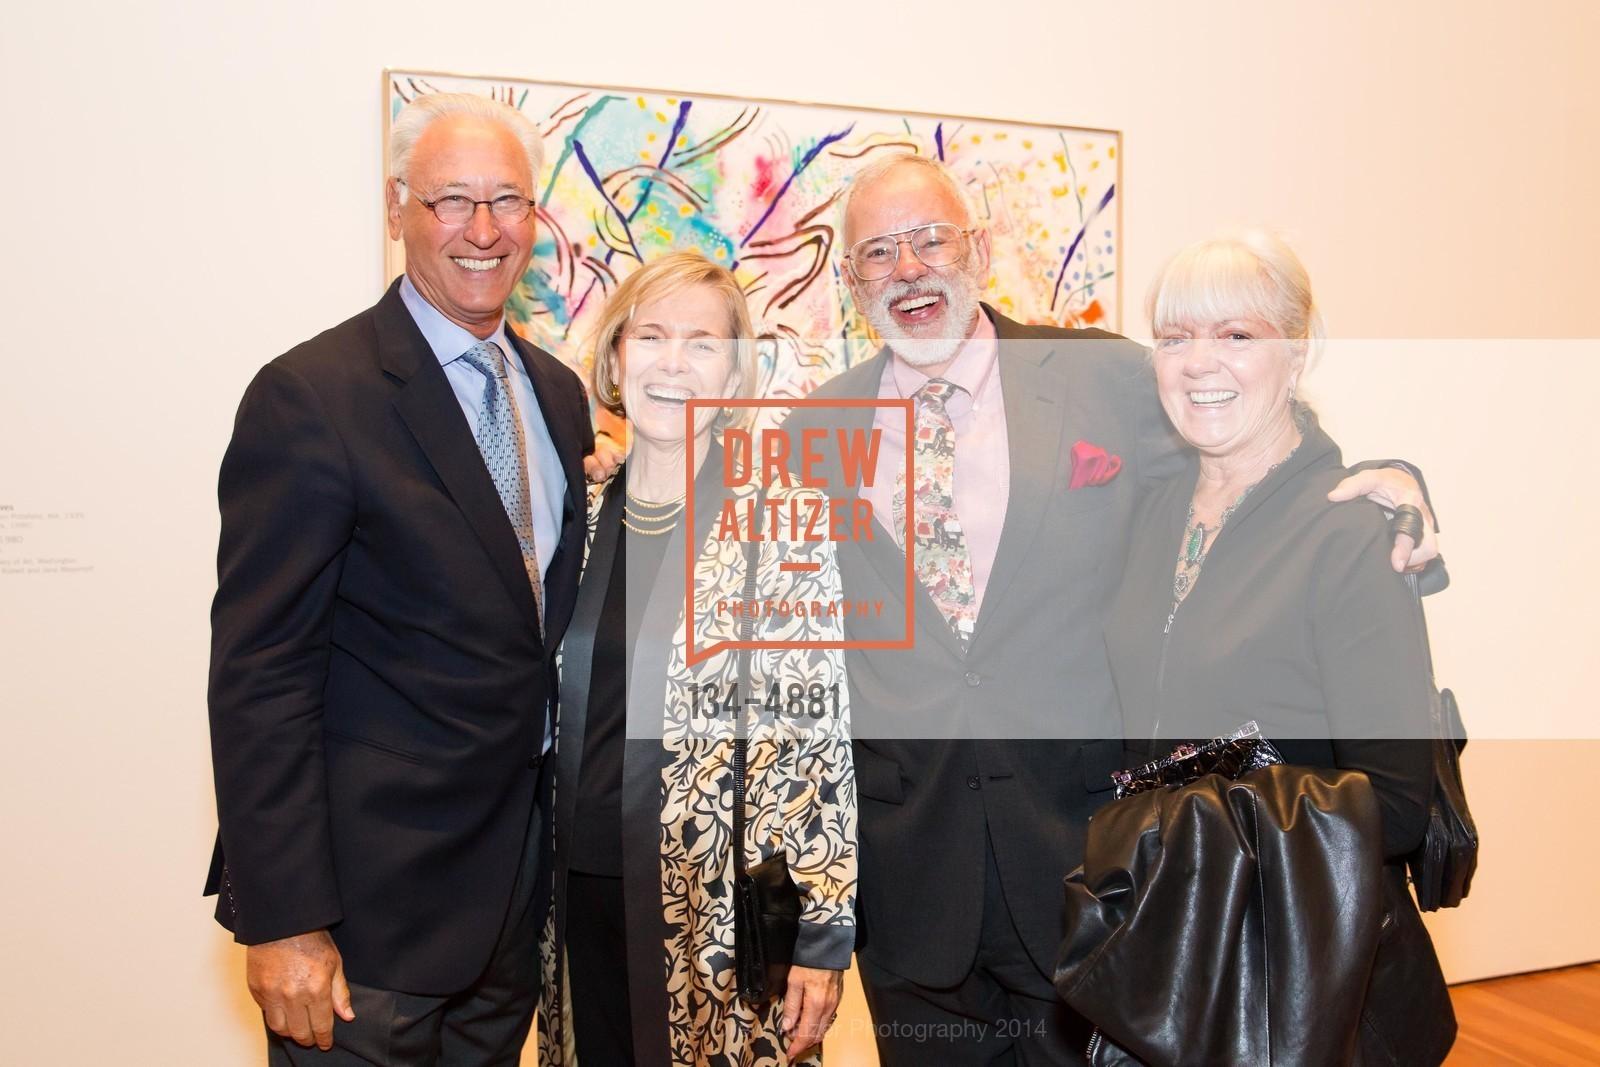 Alan Davis, Peggy Greenfield, Richard Greenfield, Mary Lou Dauray, Photo #134-4881